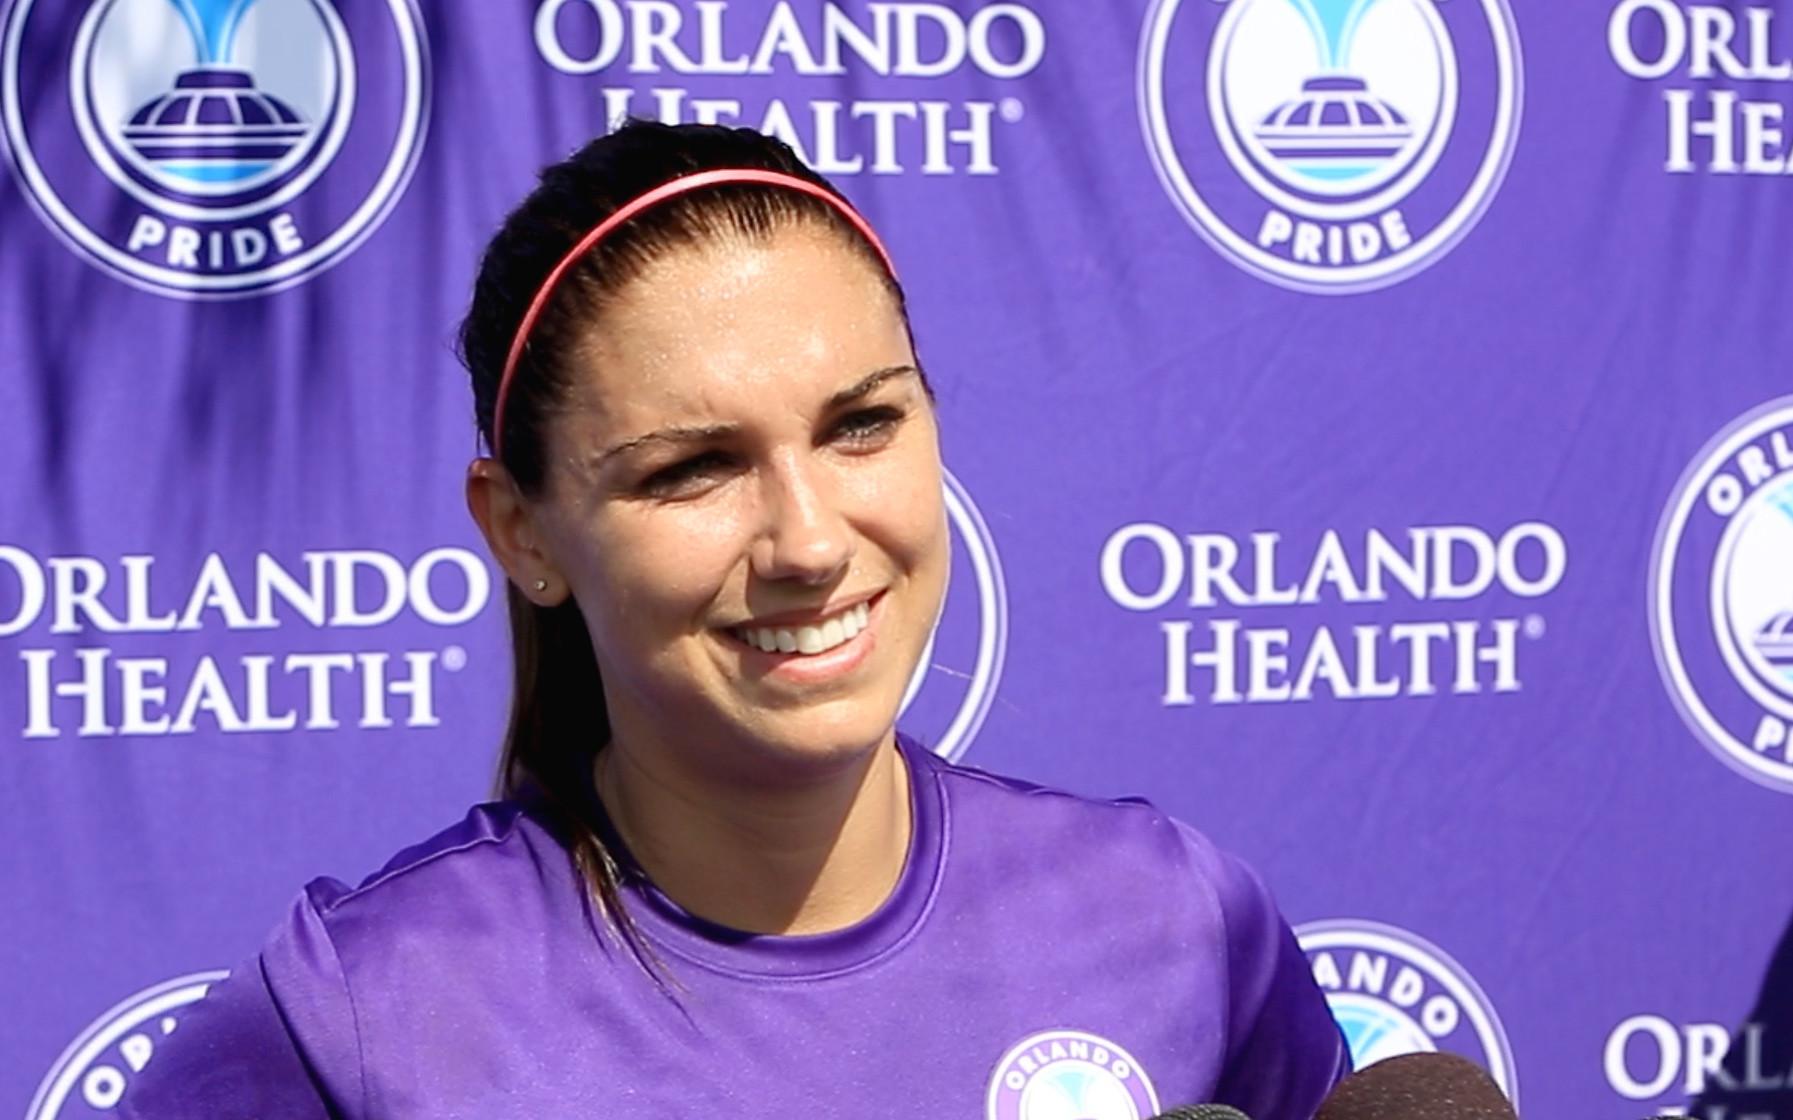 36afe3fe972 Orlando Pride star Alex Morgan to make her 2017 debut Saturday against  Chicago at Orlando City Stadium - Orlando Sentinel